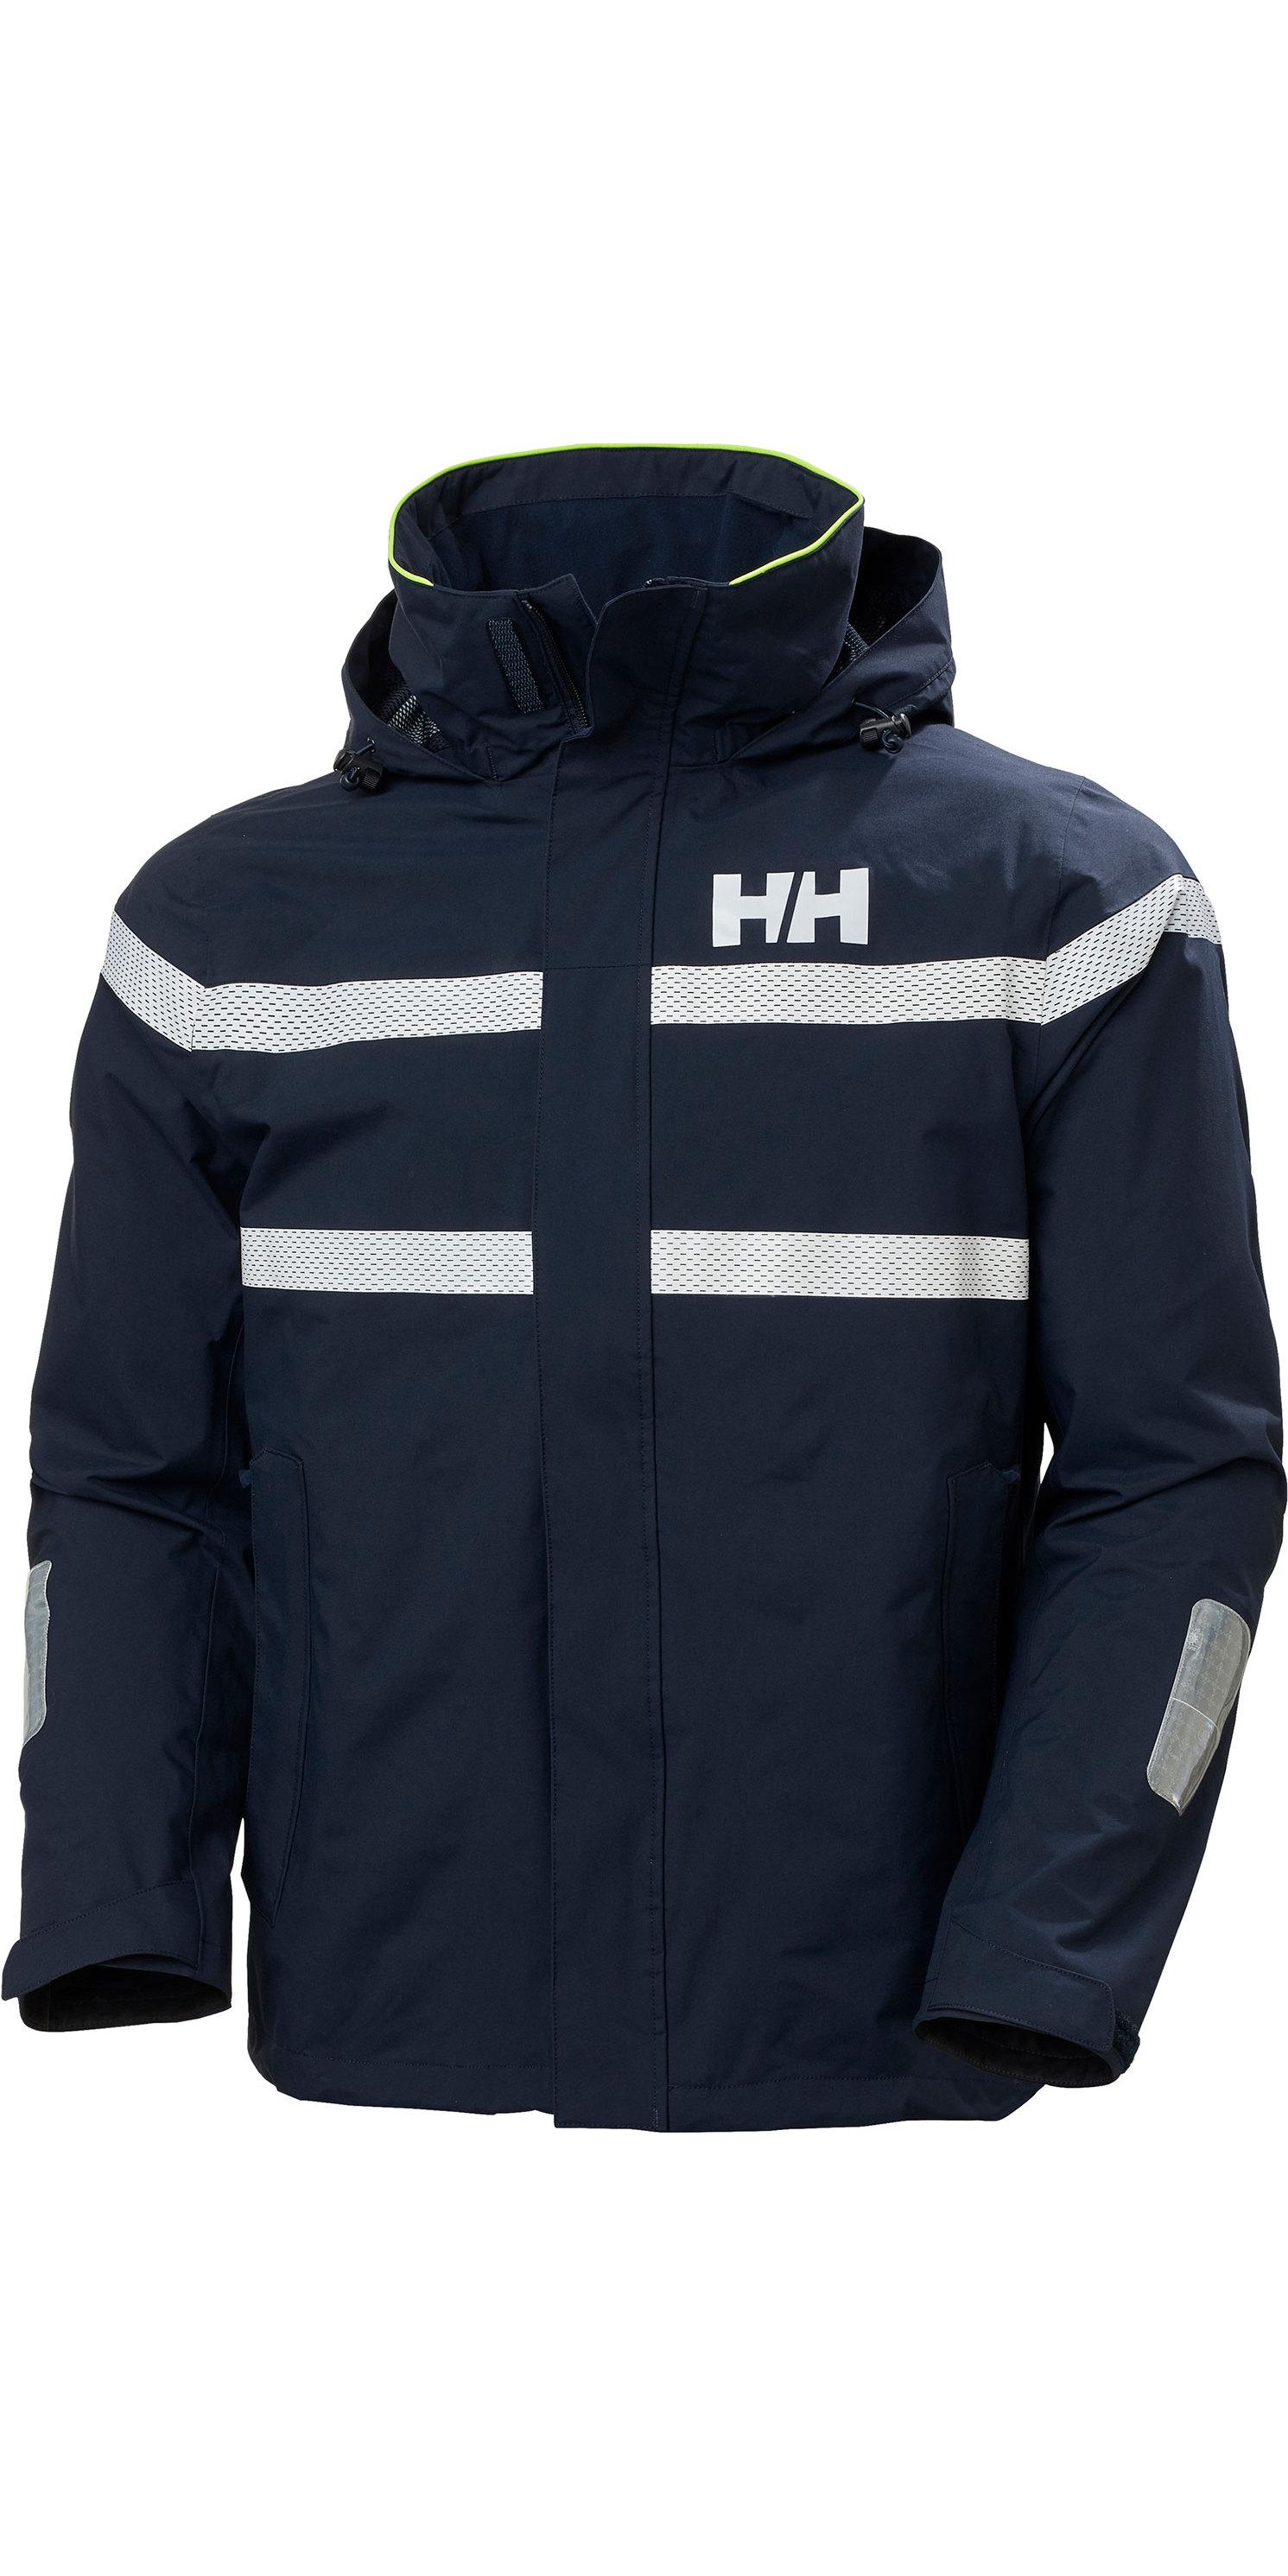 2020 Helly Hansen Mens Saltro Sailing Jacket 34173 Navy